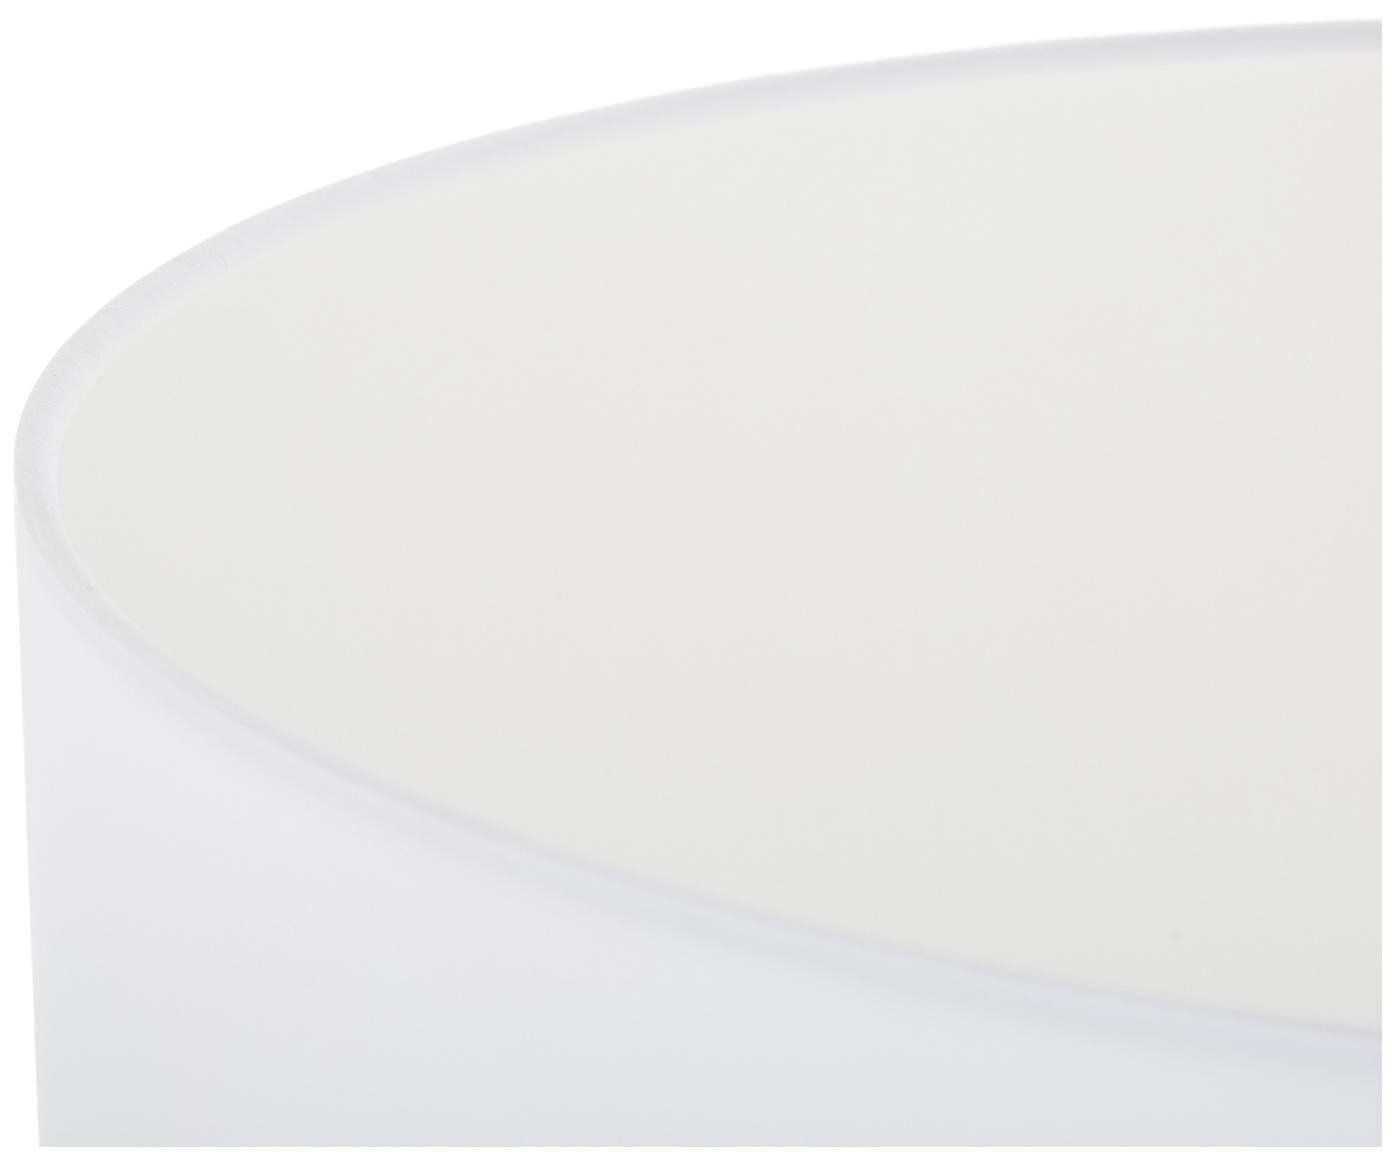 Vloerlamp Cella, Lampenkap: katoen, Lampvoet: metaal, Lampvoet: glanzend goudkleurig. Lampenkap: wit, Ø 45 x H 148 cm